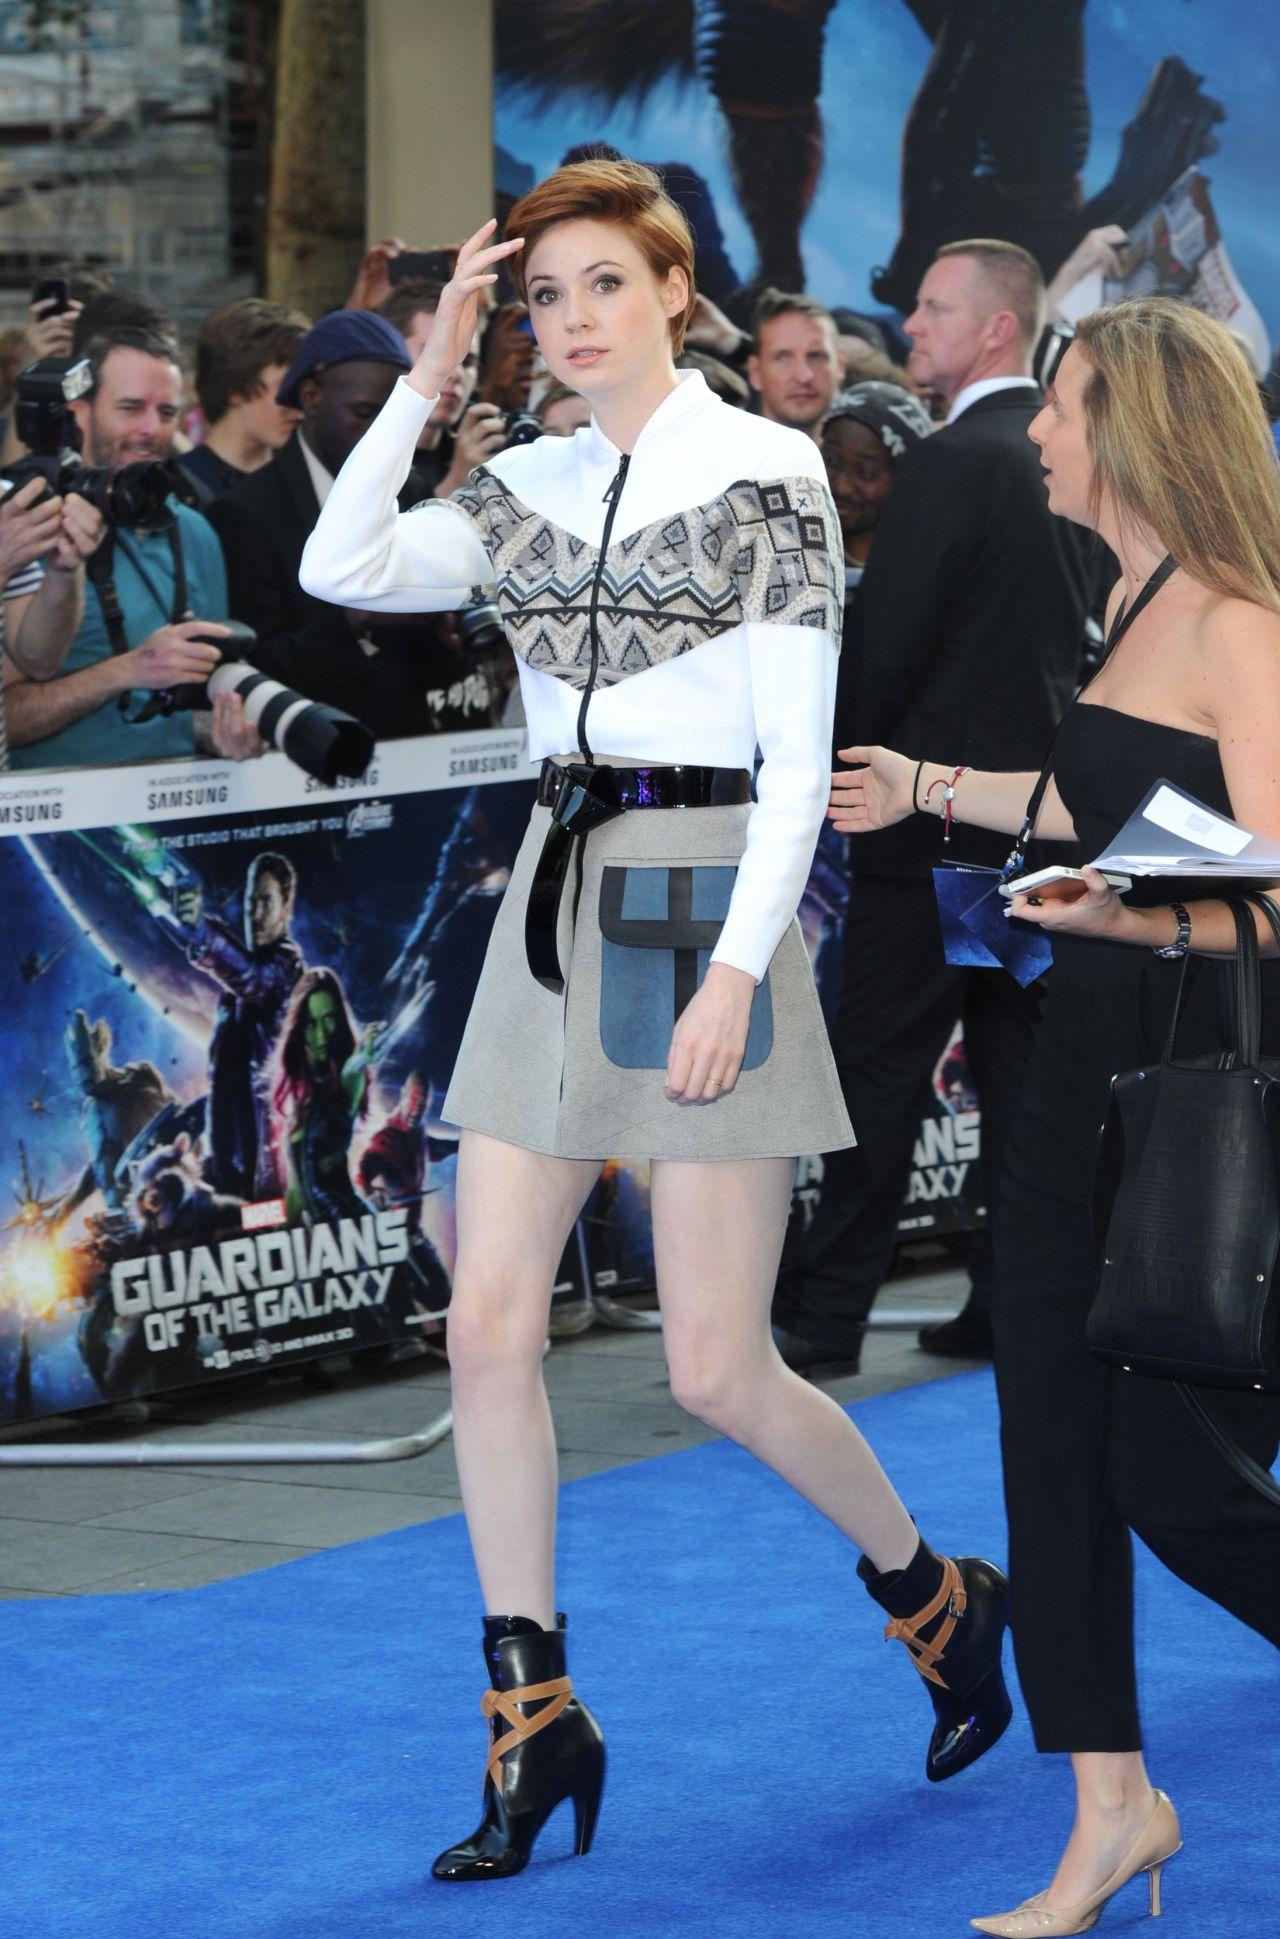 Karen Gillan Guardians Of The Galaxy Premiere In London